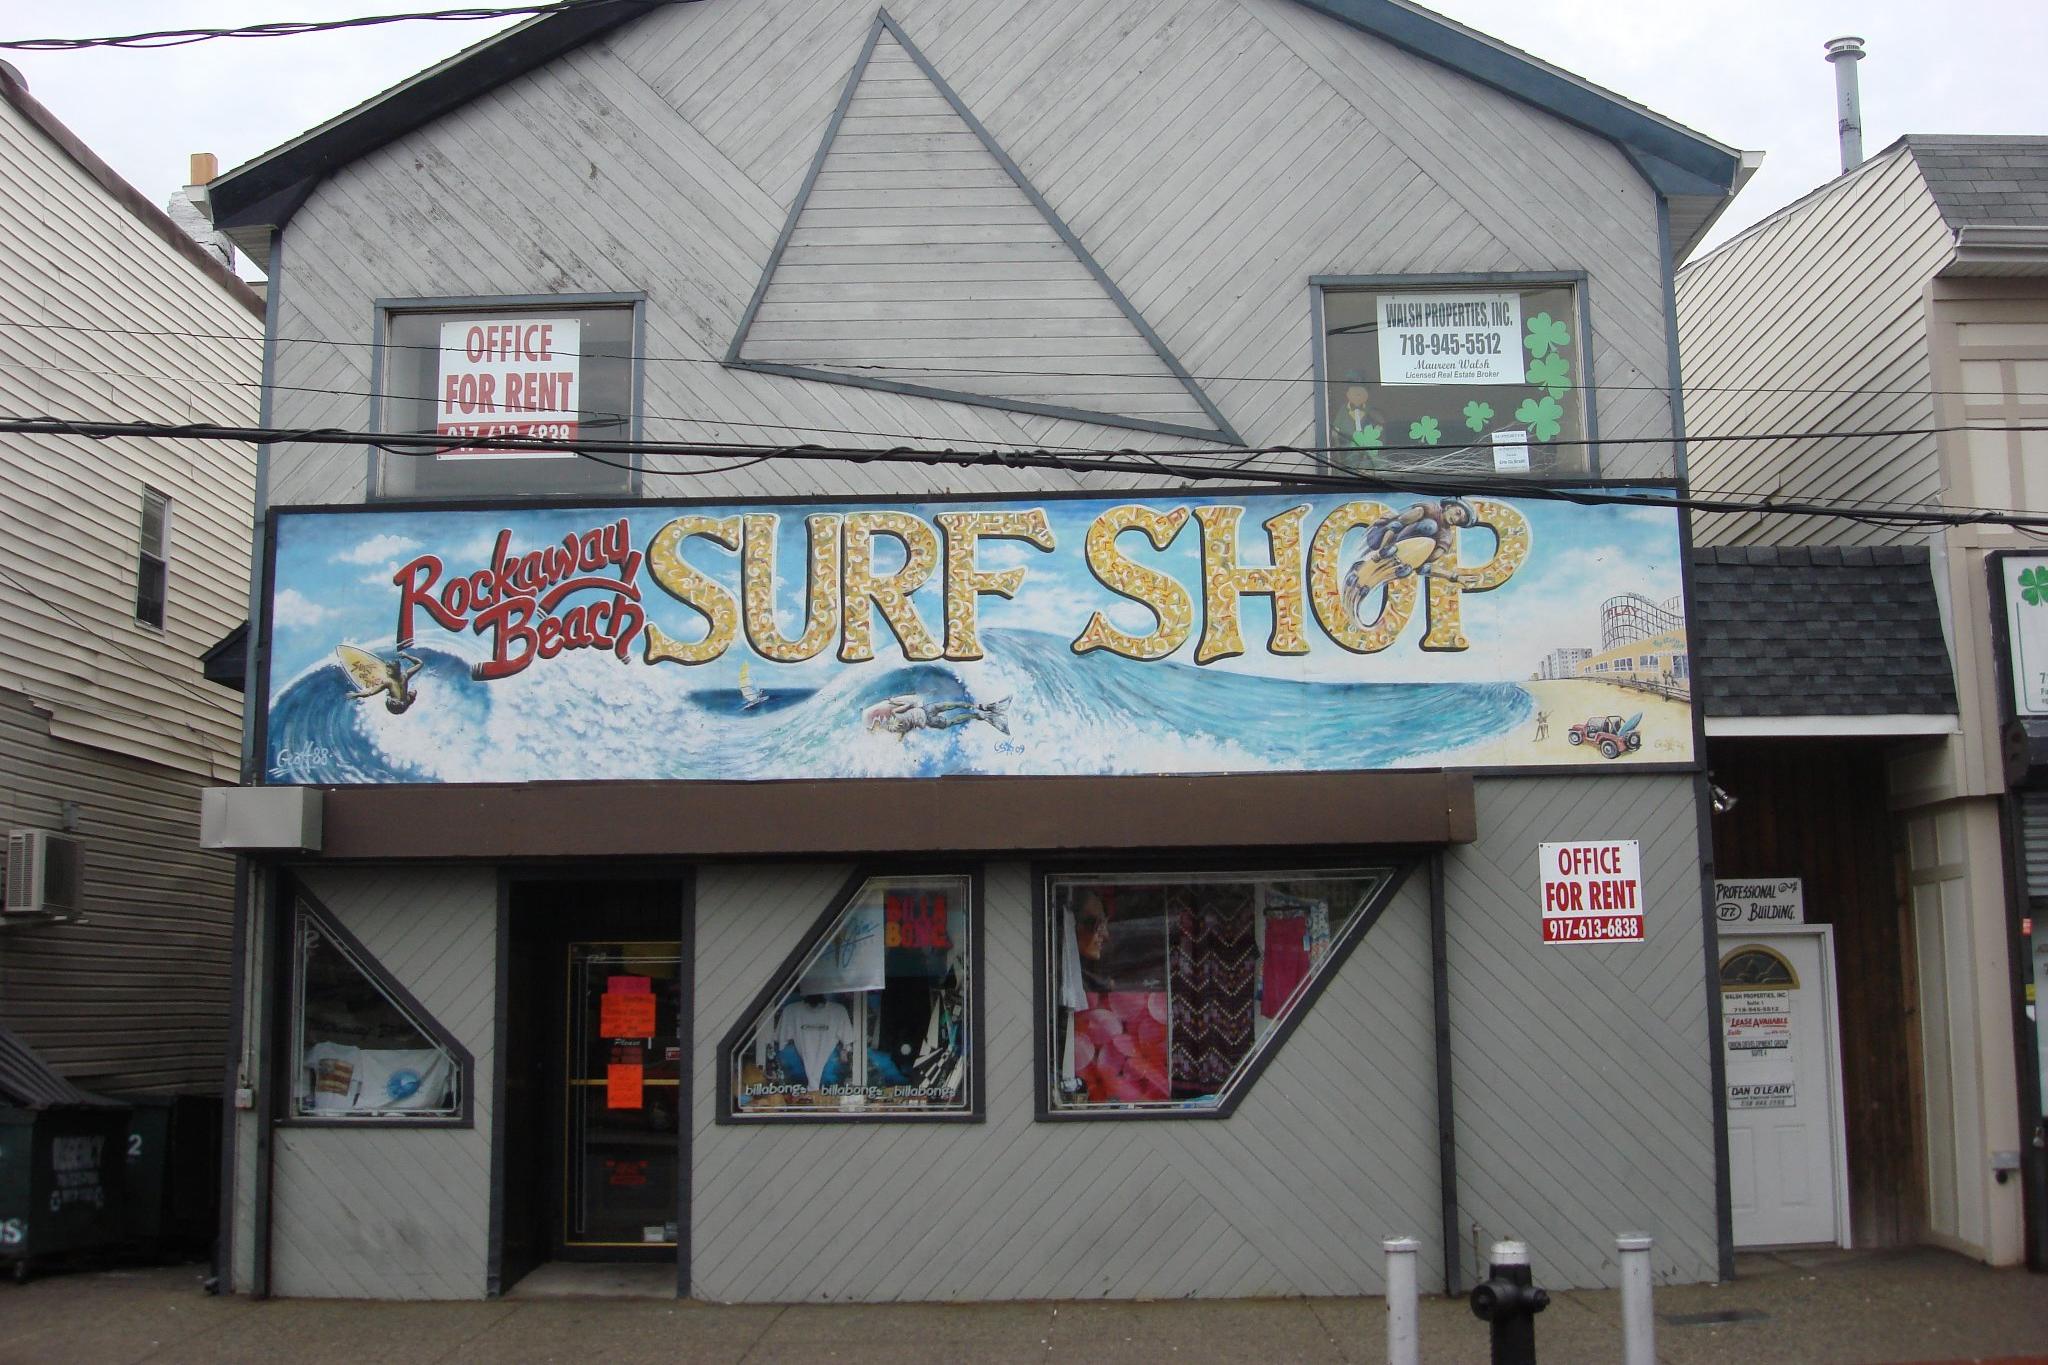 Rockaway Beach Surf Shop